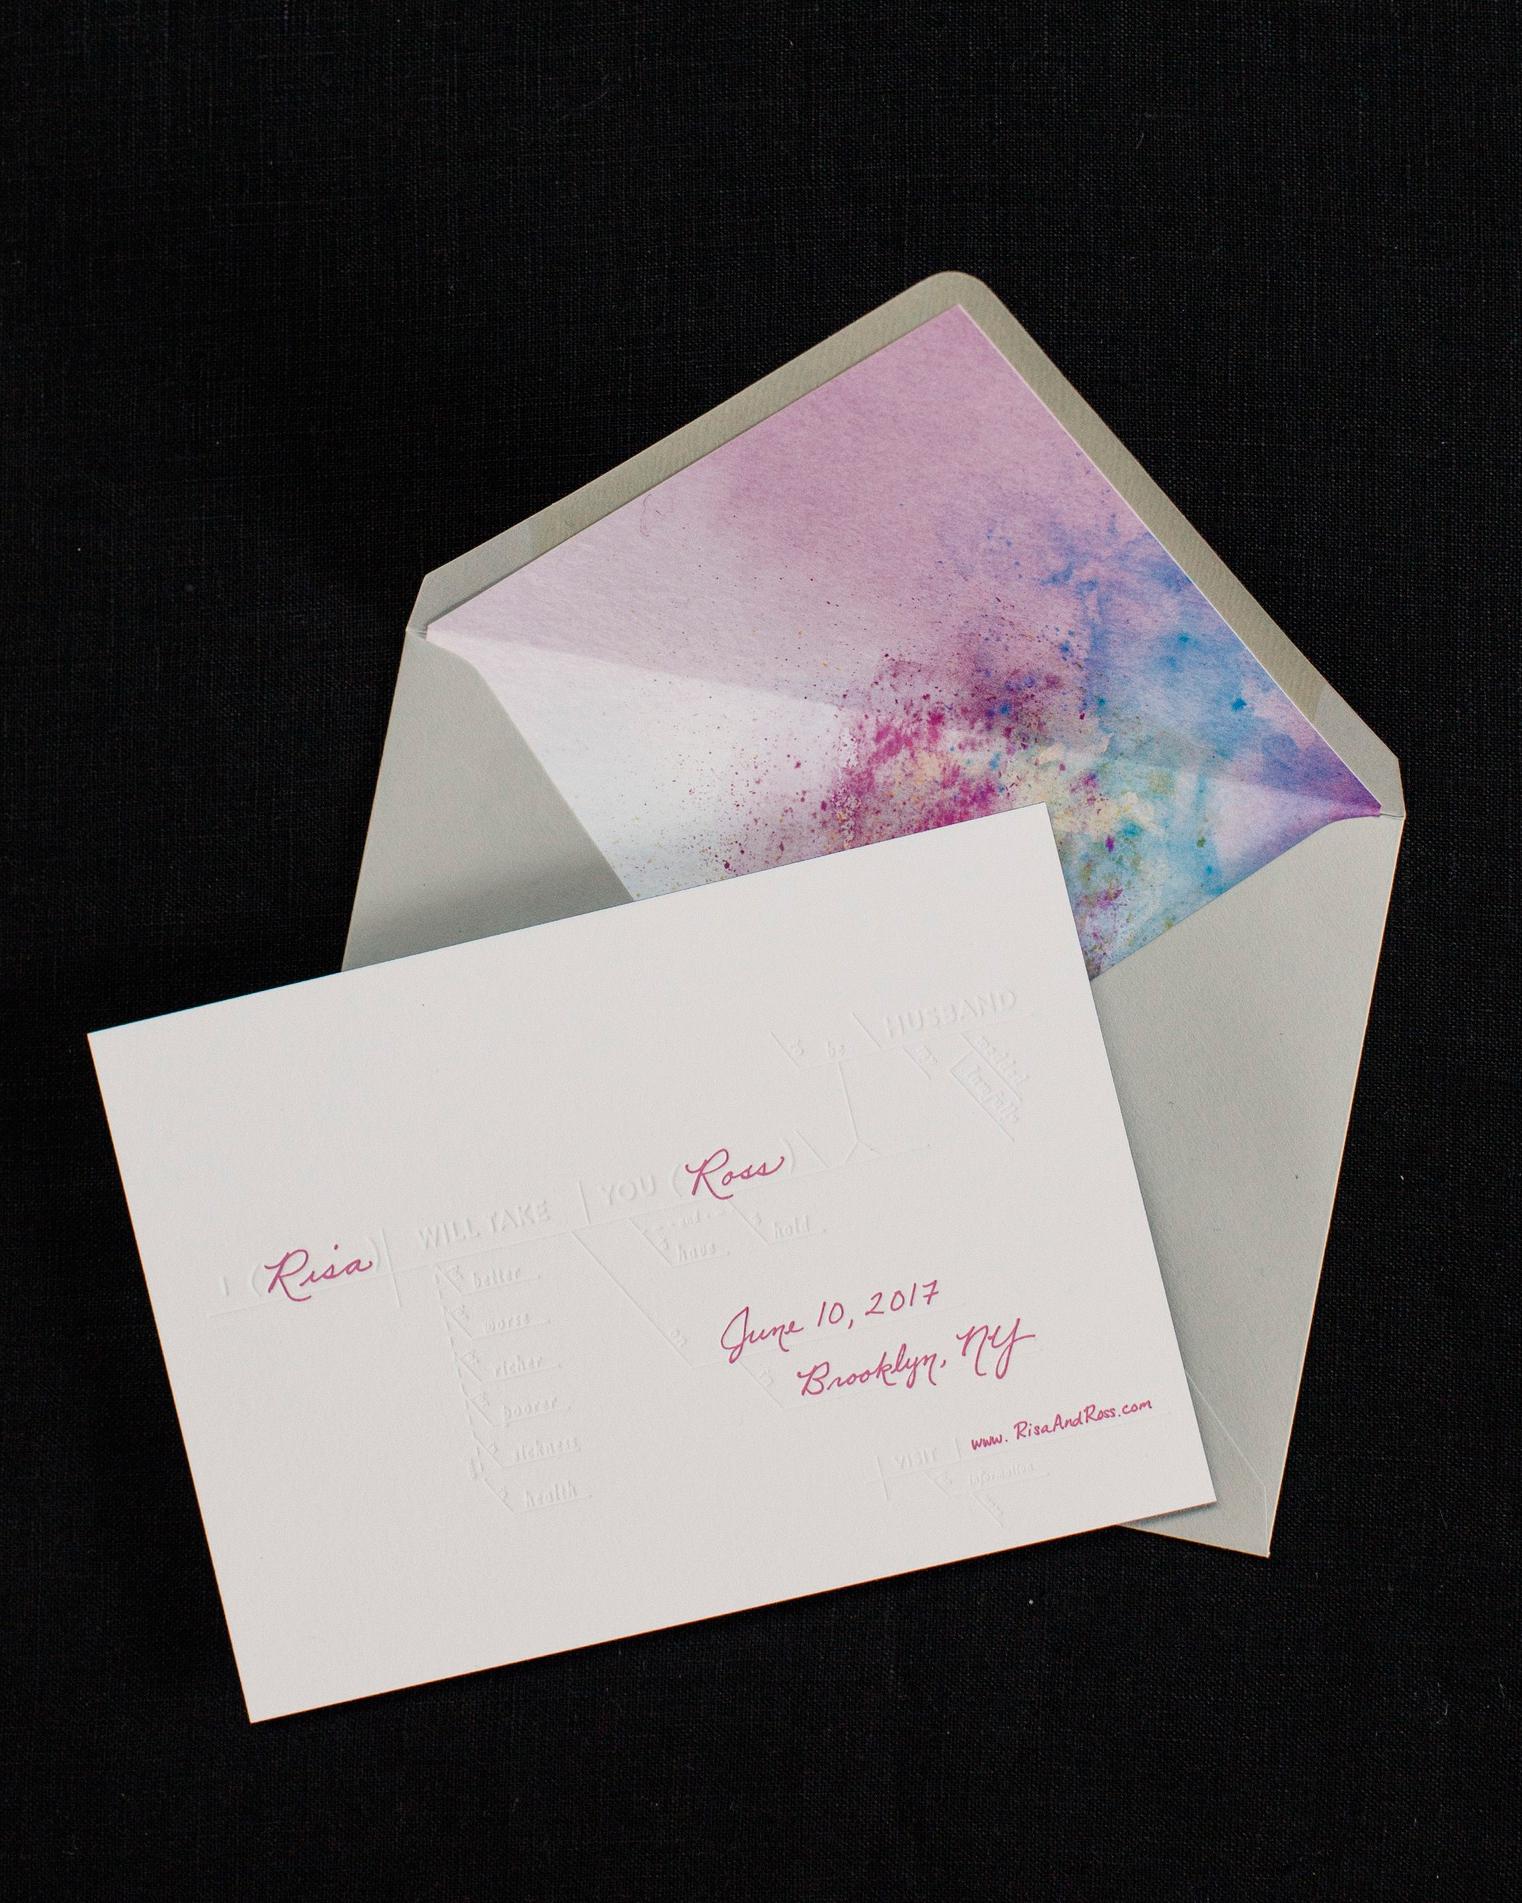 risa ross wedding brooklyn new york invitation